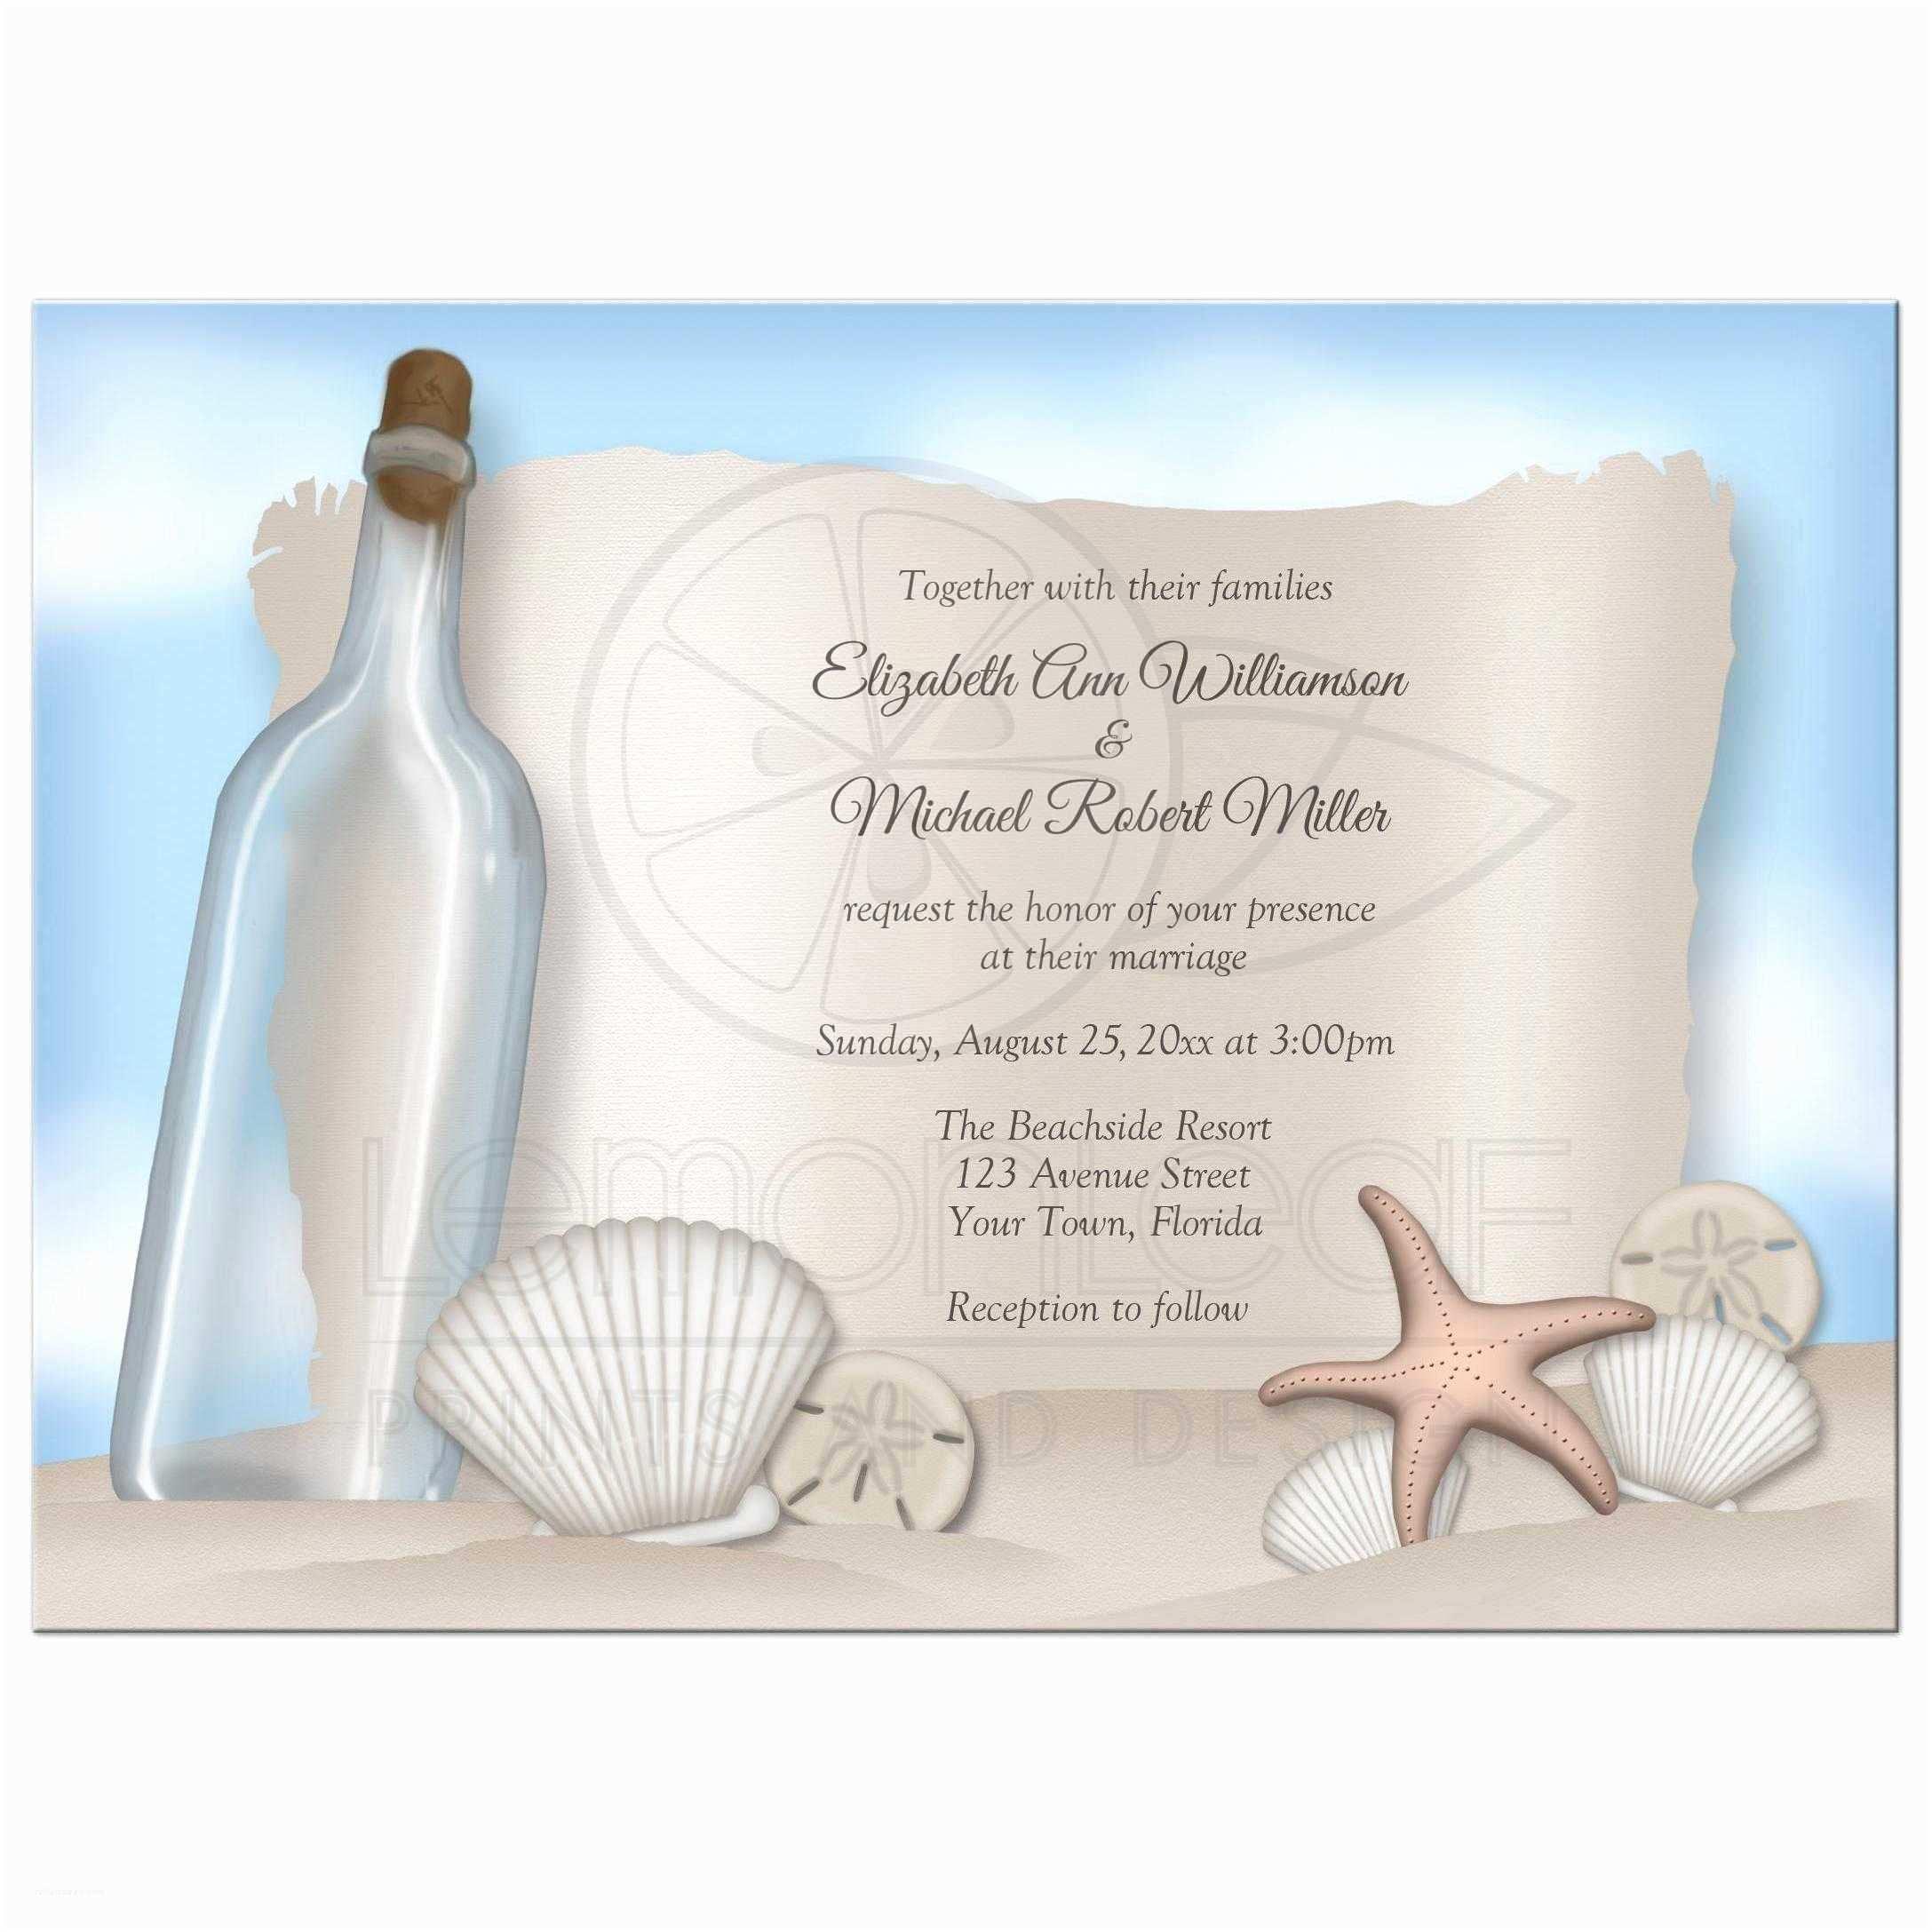 Beach Wedding Invitation Sample Wedding Invitation Beach Wedding Invitation Wording